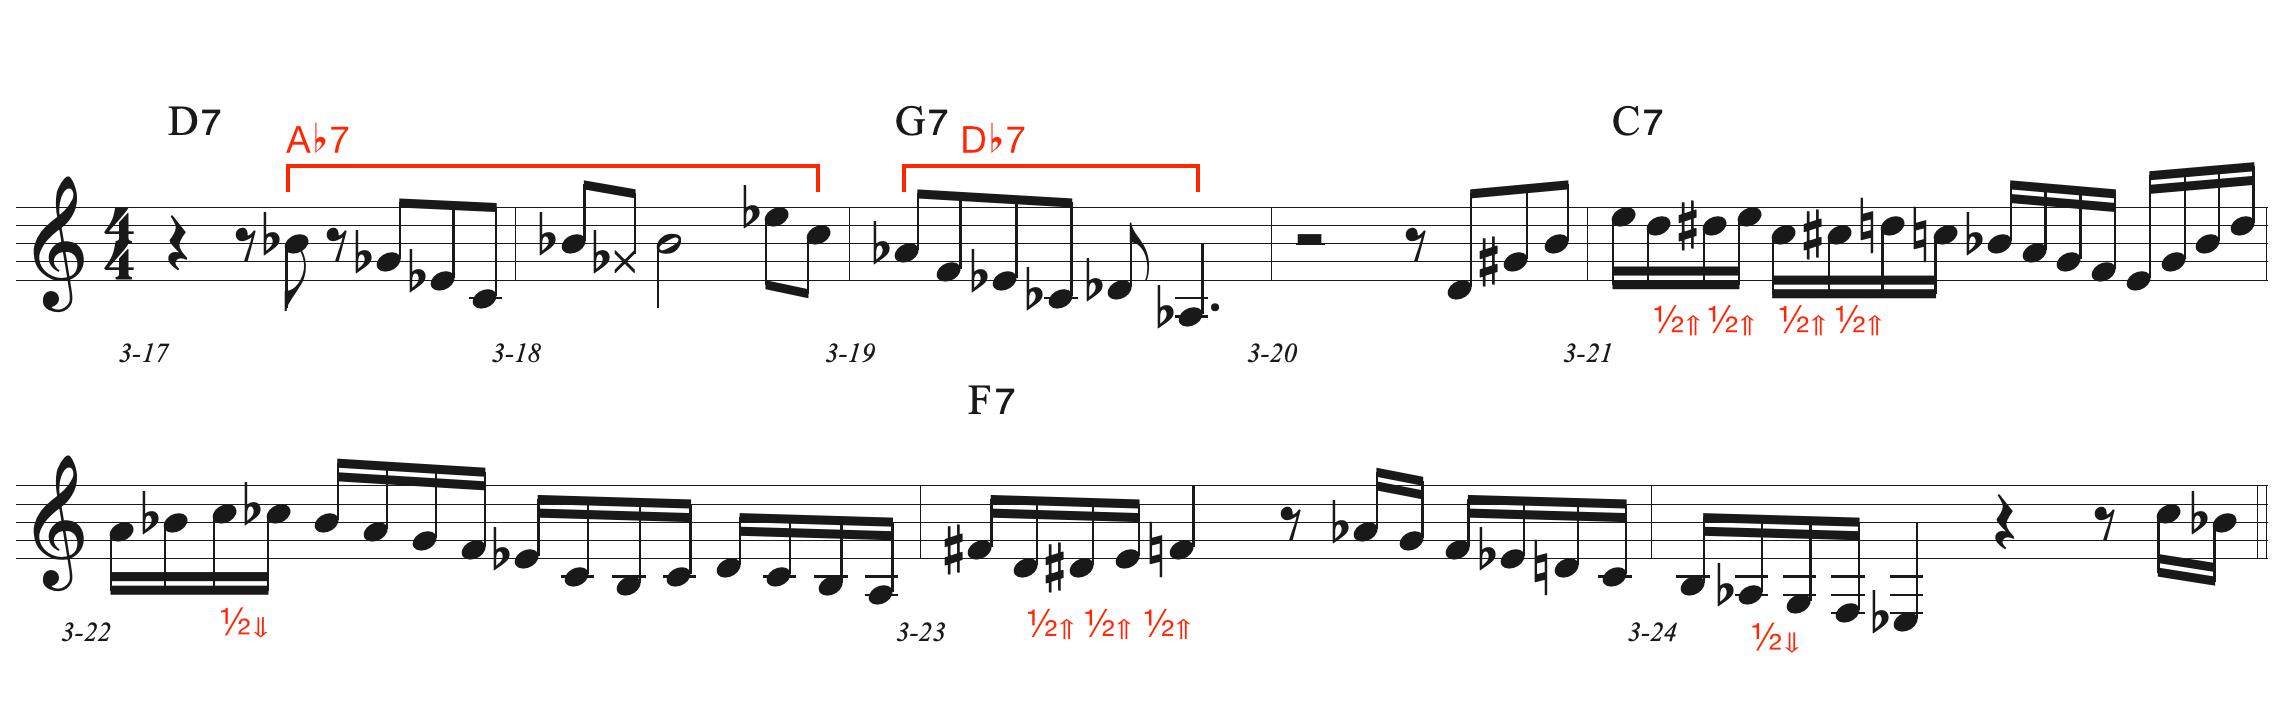 3rd chorus - bridge